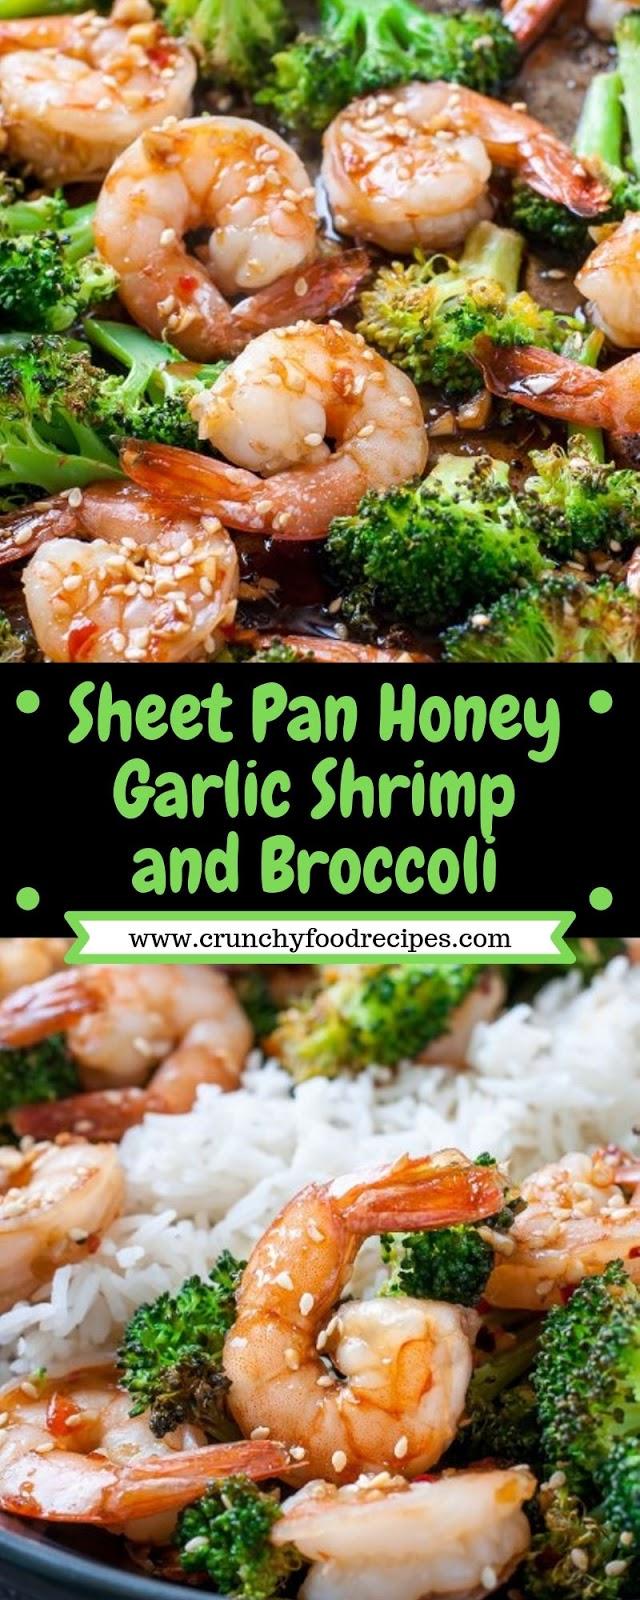 Sheet Pan Honey Garlic Shrimp and Broccoli